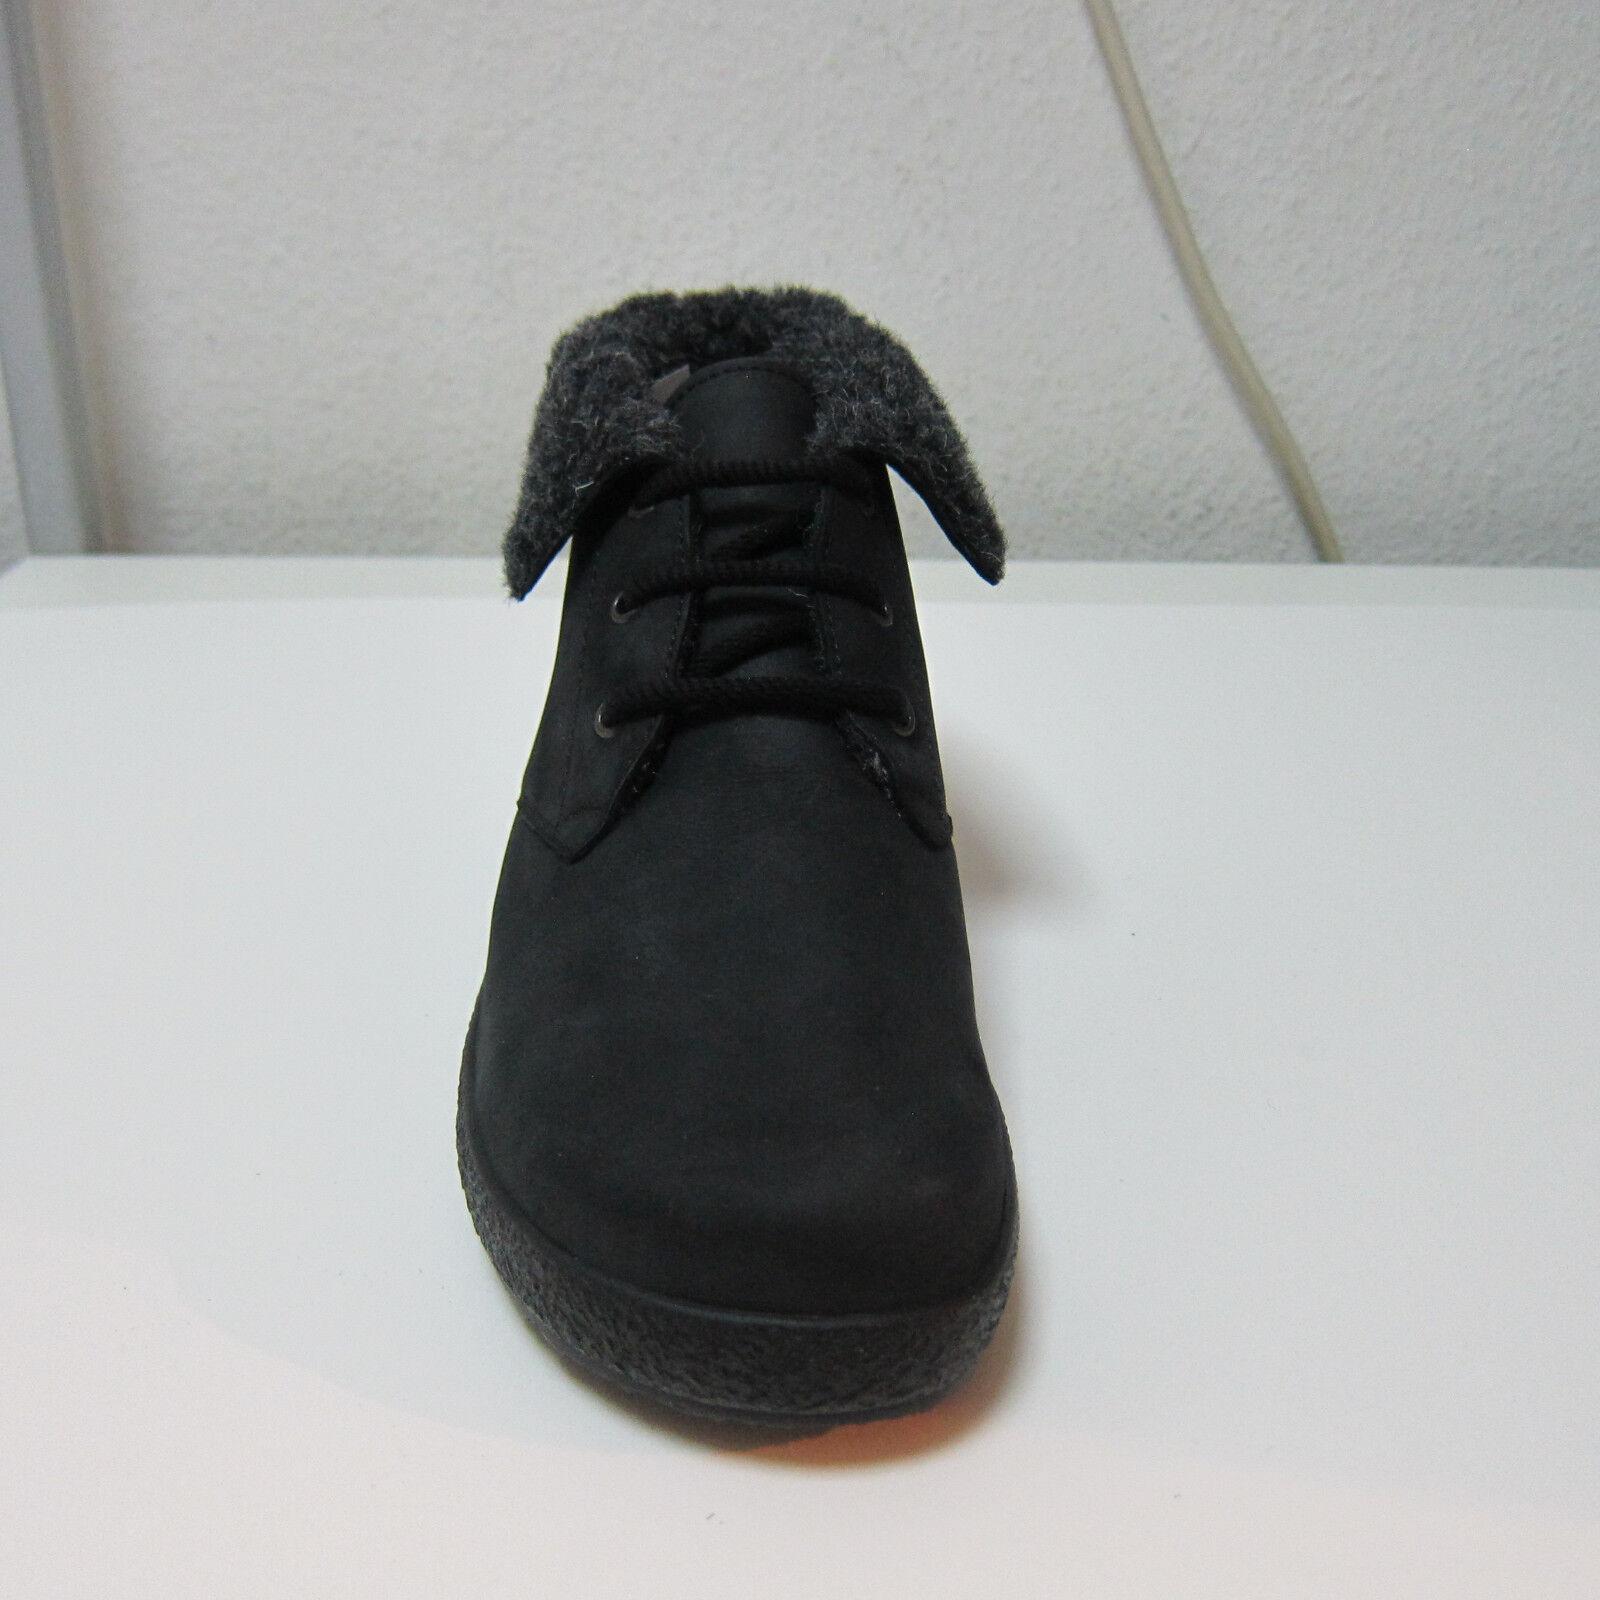 miglior servizio Berkemann da donna basse stivali romira tg. 7,5 (41,5)    1812   preferenziale